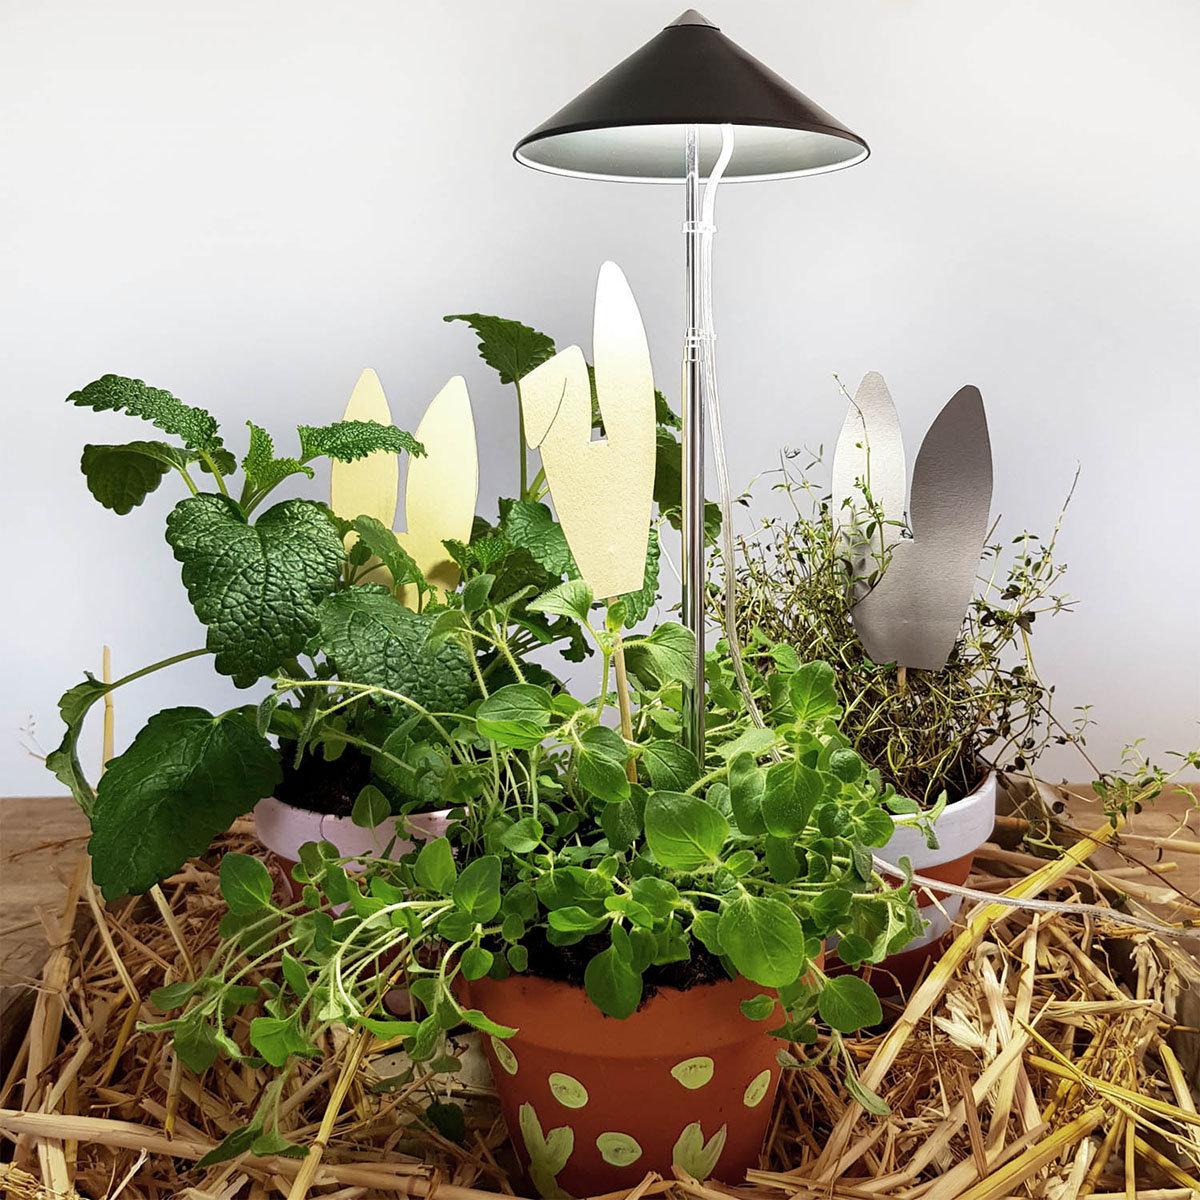 Sunlite Pflanzenlampe, 7 W, 28-100 cm, Ø 11, Kabel 4 m,Aluminium, grau | #3